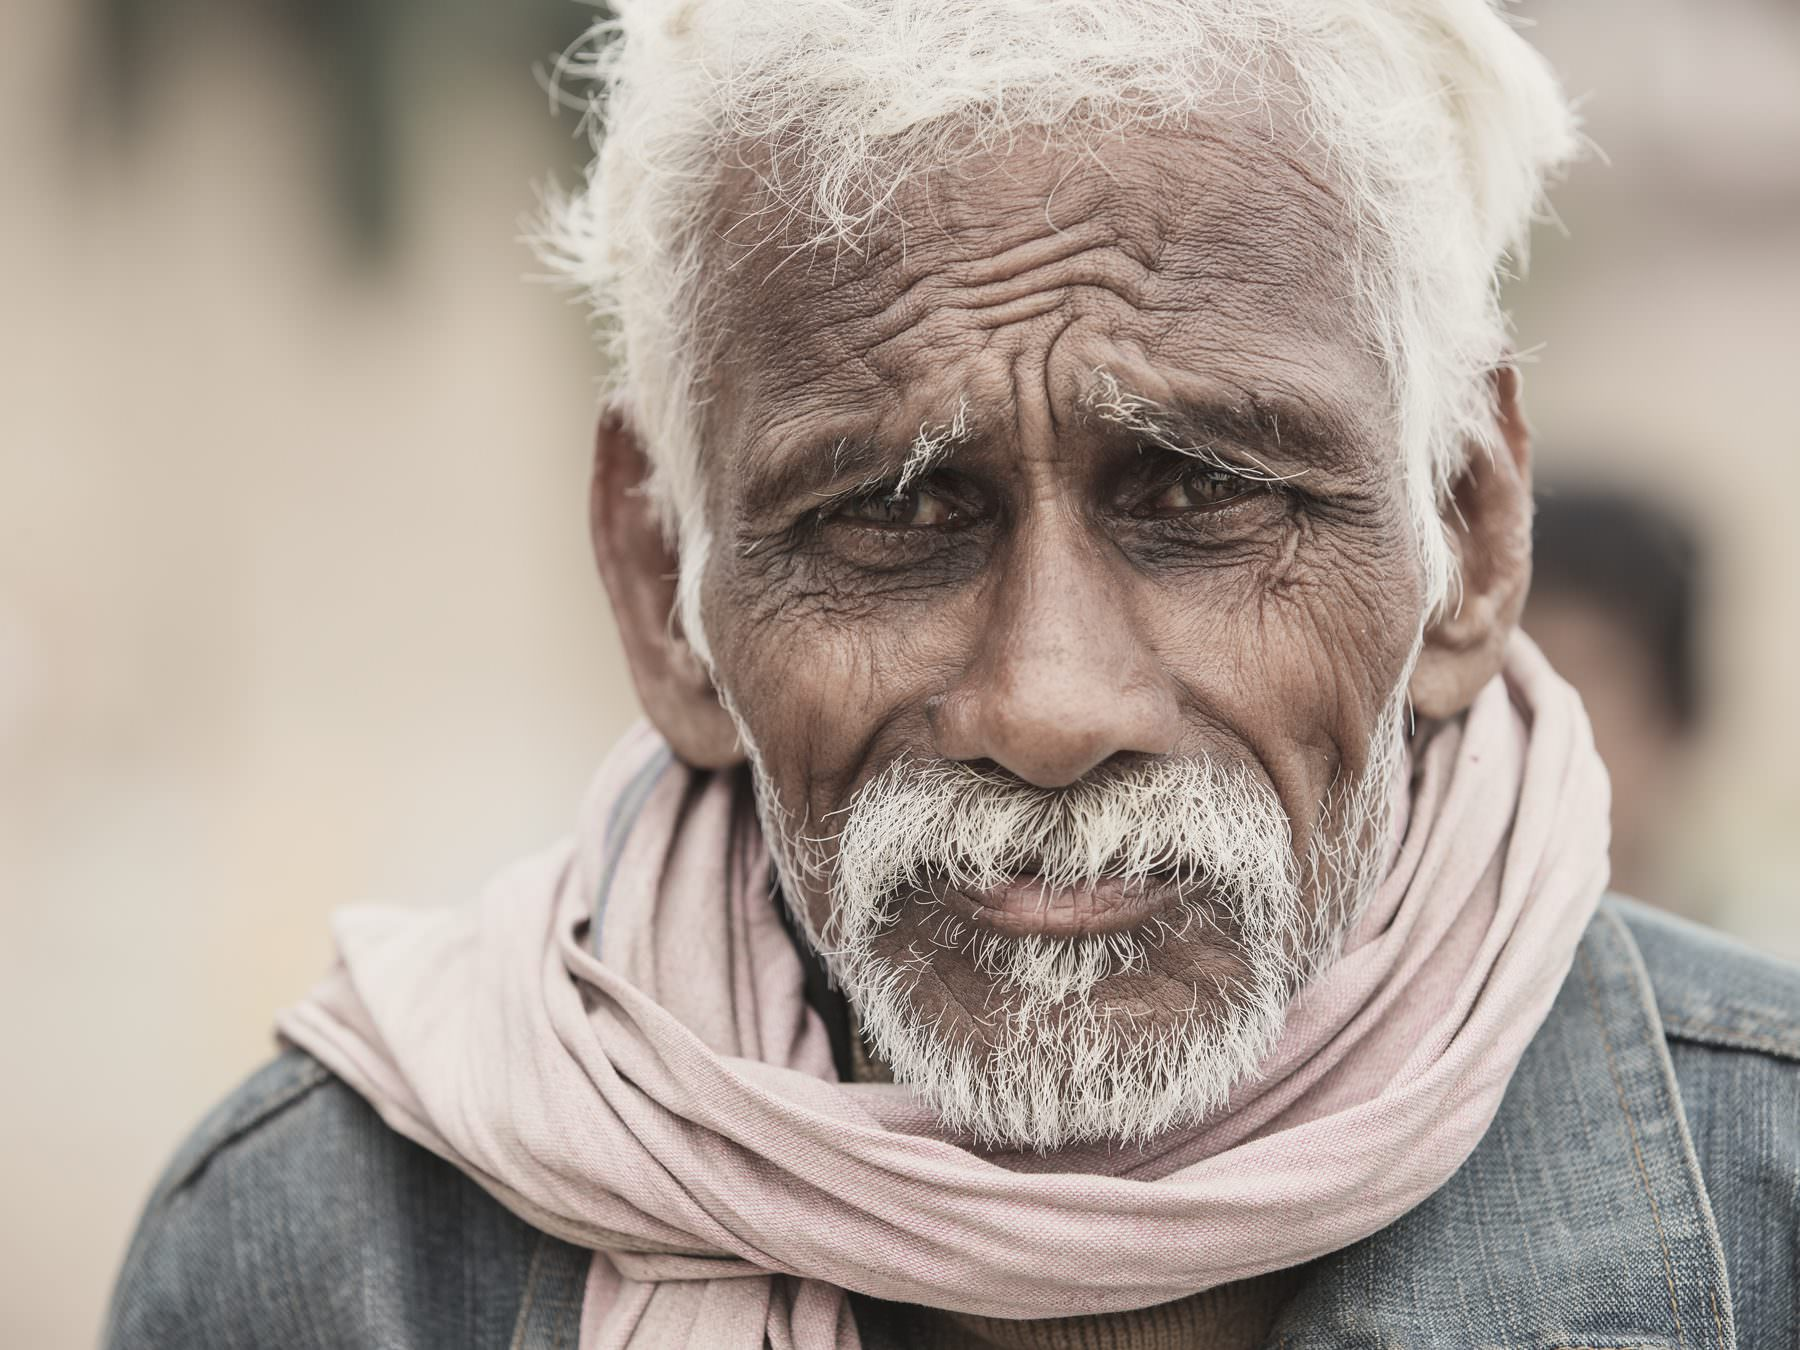 India, Varanasi, a local somewhere in Varanasi